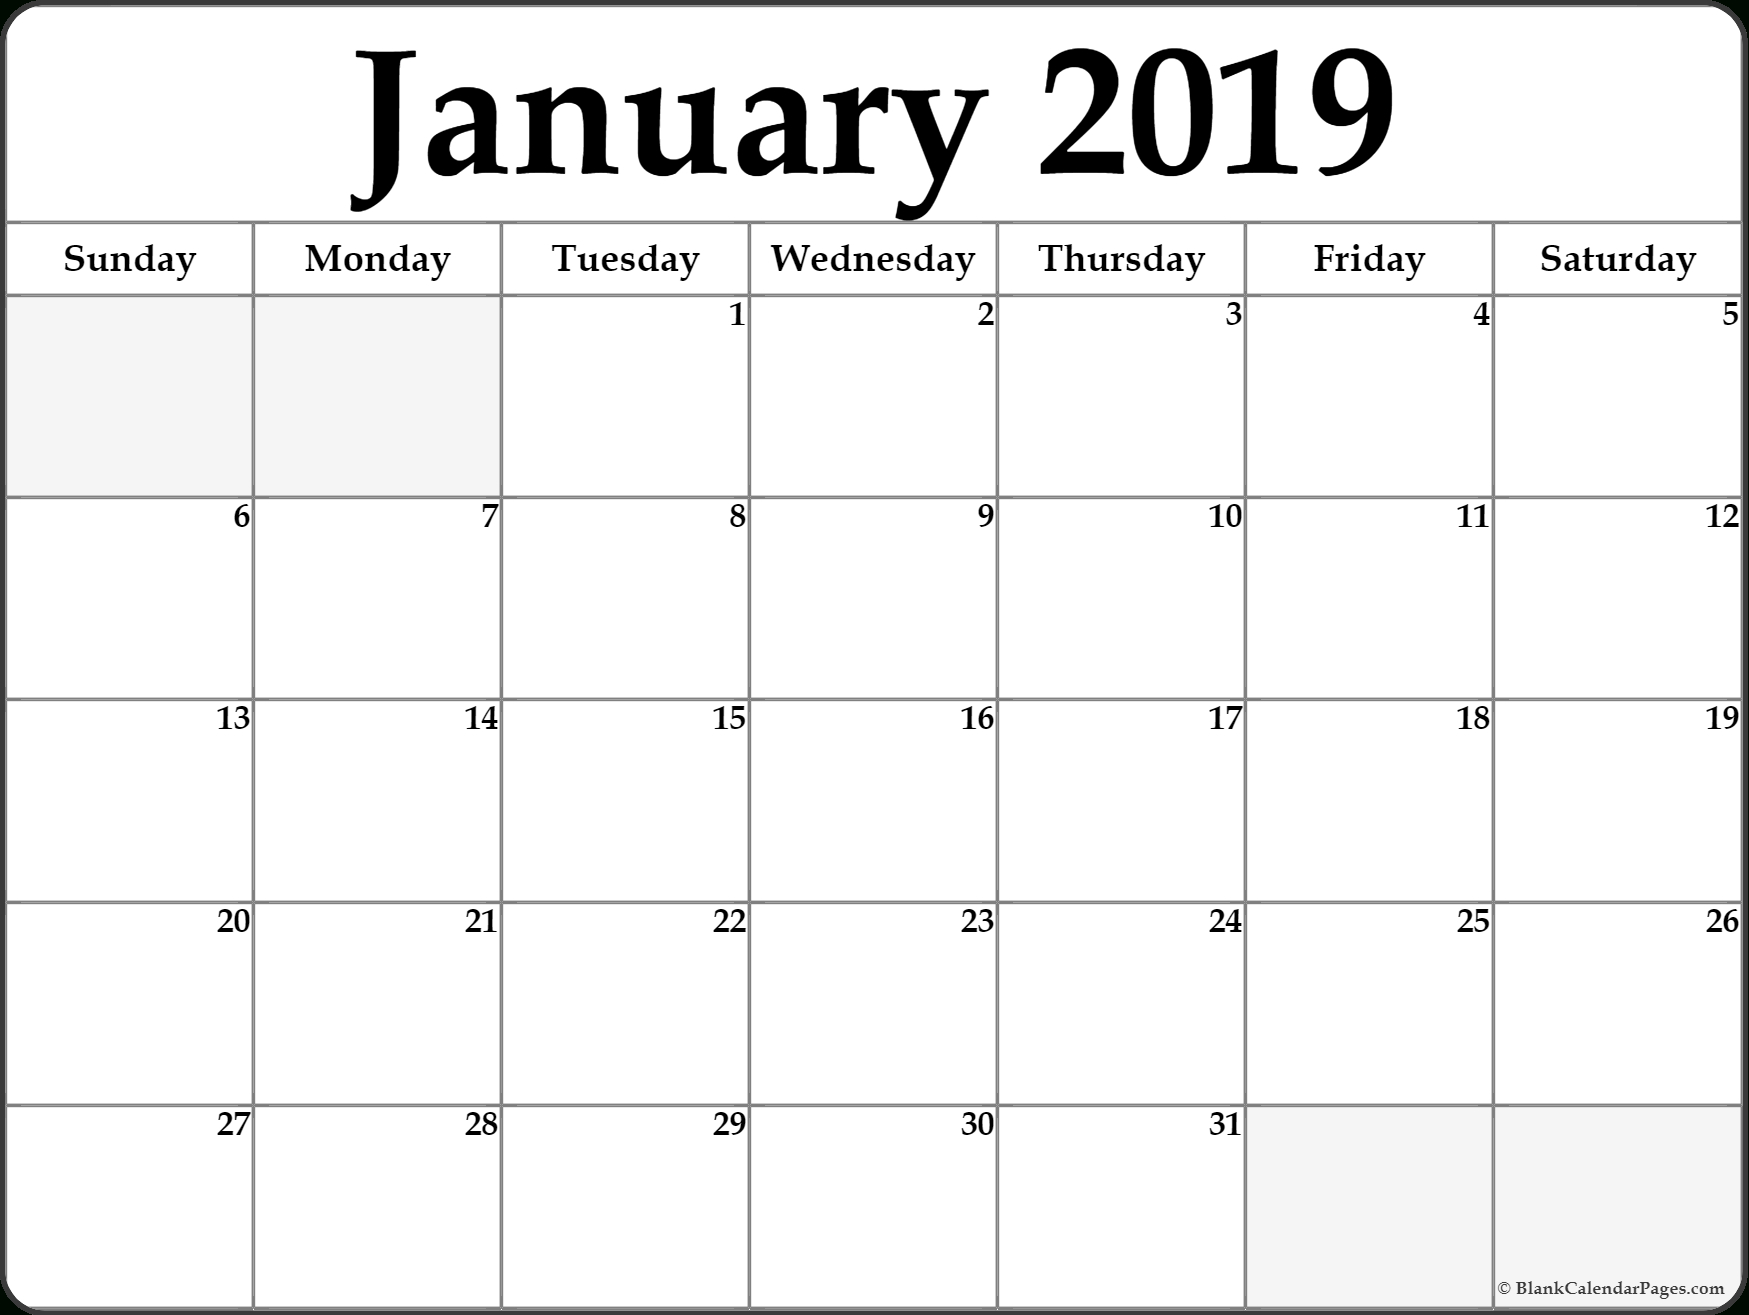 January 2019 Calendar Word - Free Printable Calendar, Blank within Legal Size Printable Monthly Calendar 2020